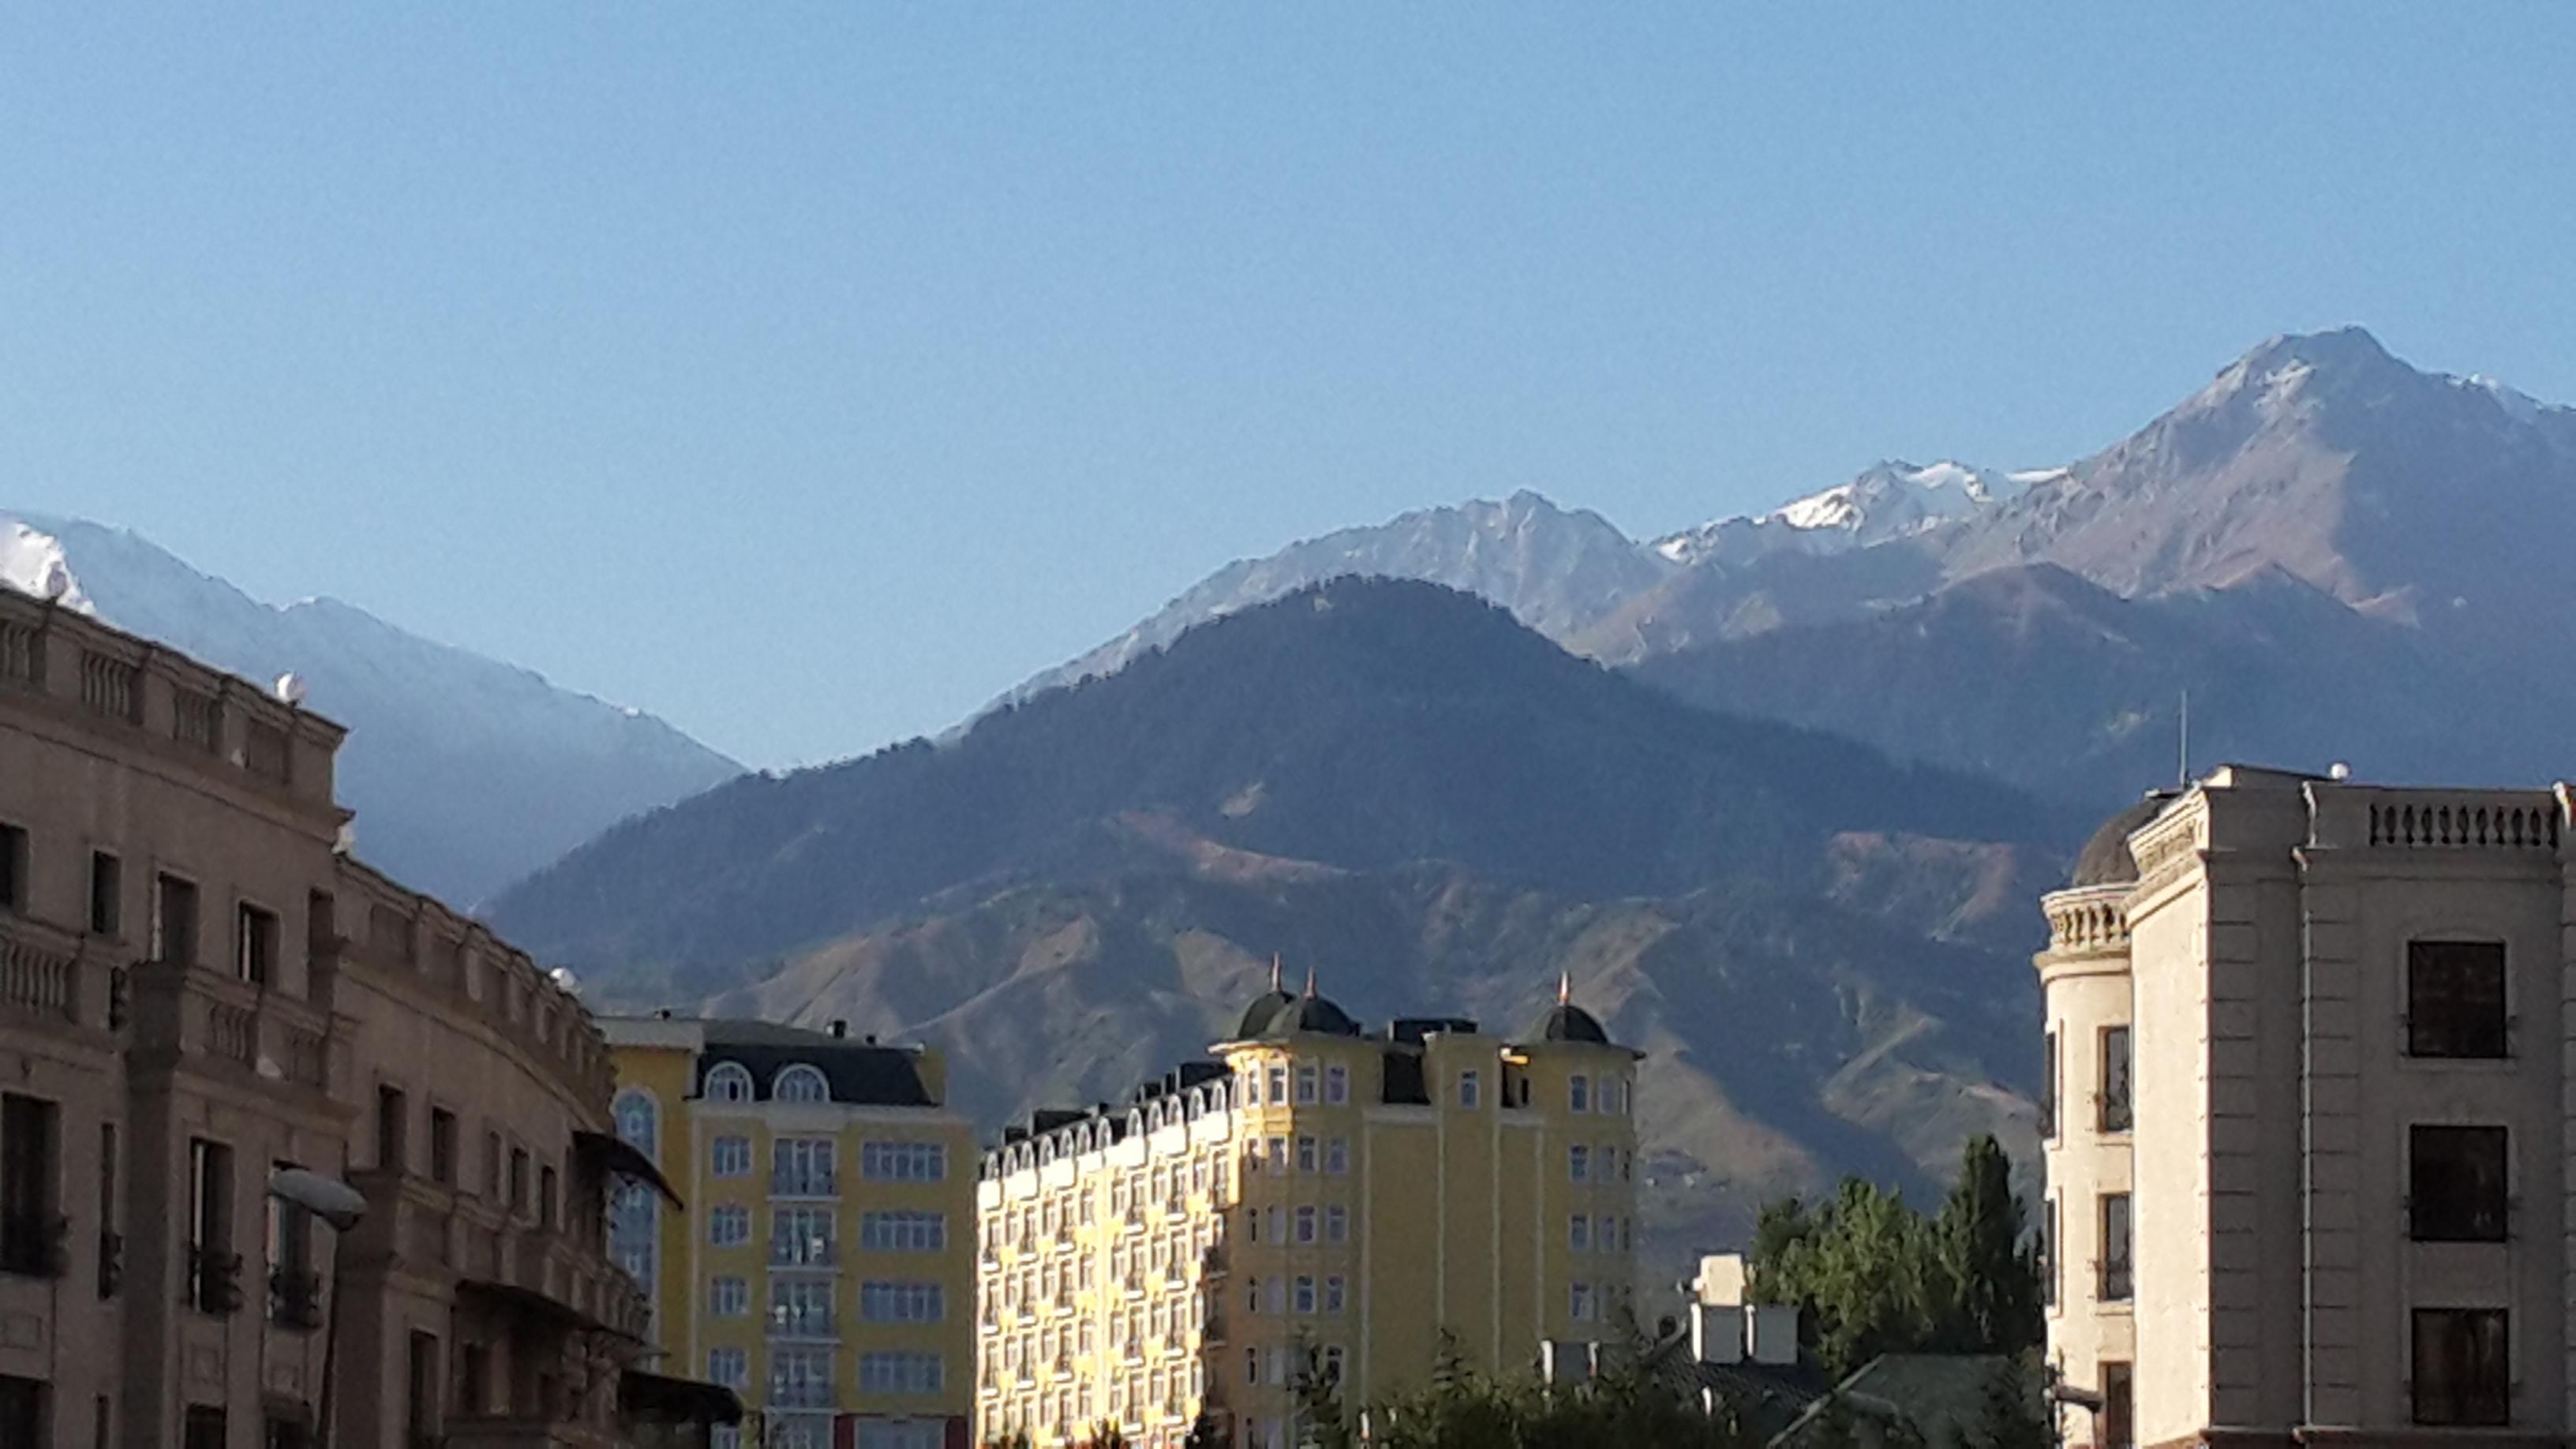 Alatau Mountains from Solichnaya Dalina Apartments in Almaty, Kazakhstan.